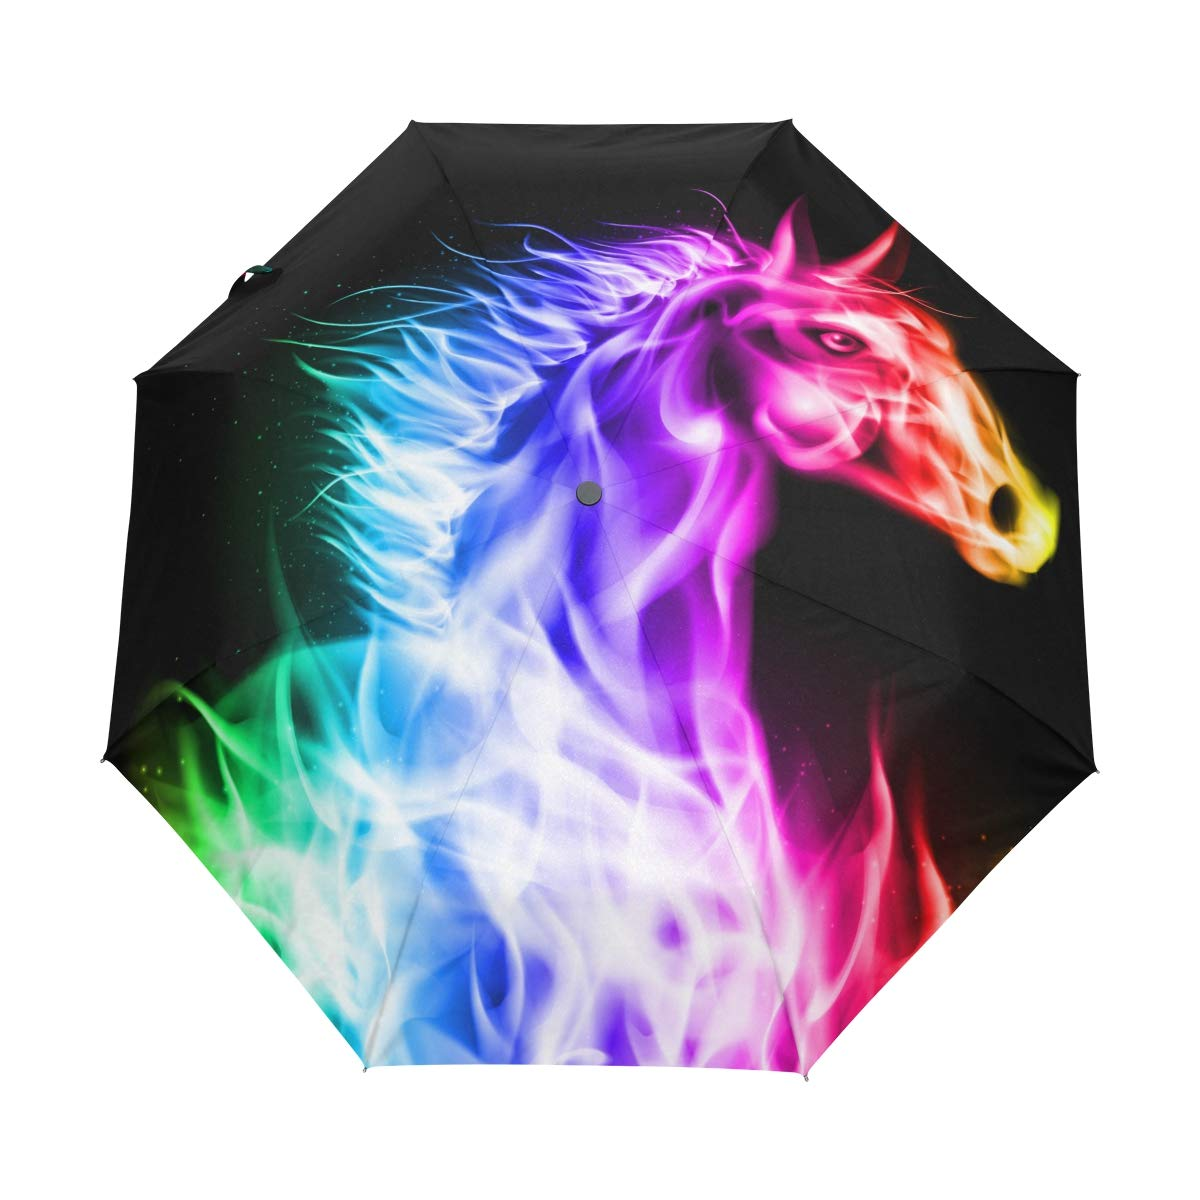 048dbdb2709c Amazon.com : CiCily Compact Travel Umbrella Colorful Horse Sun ...